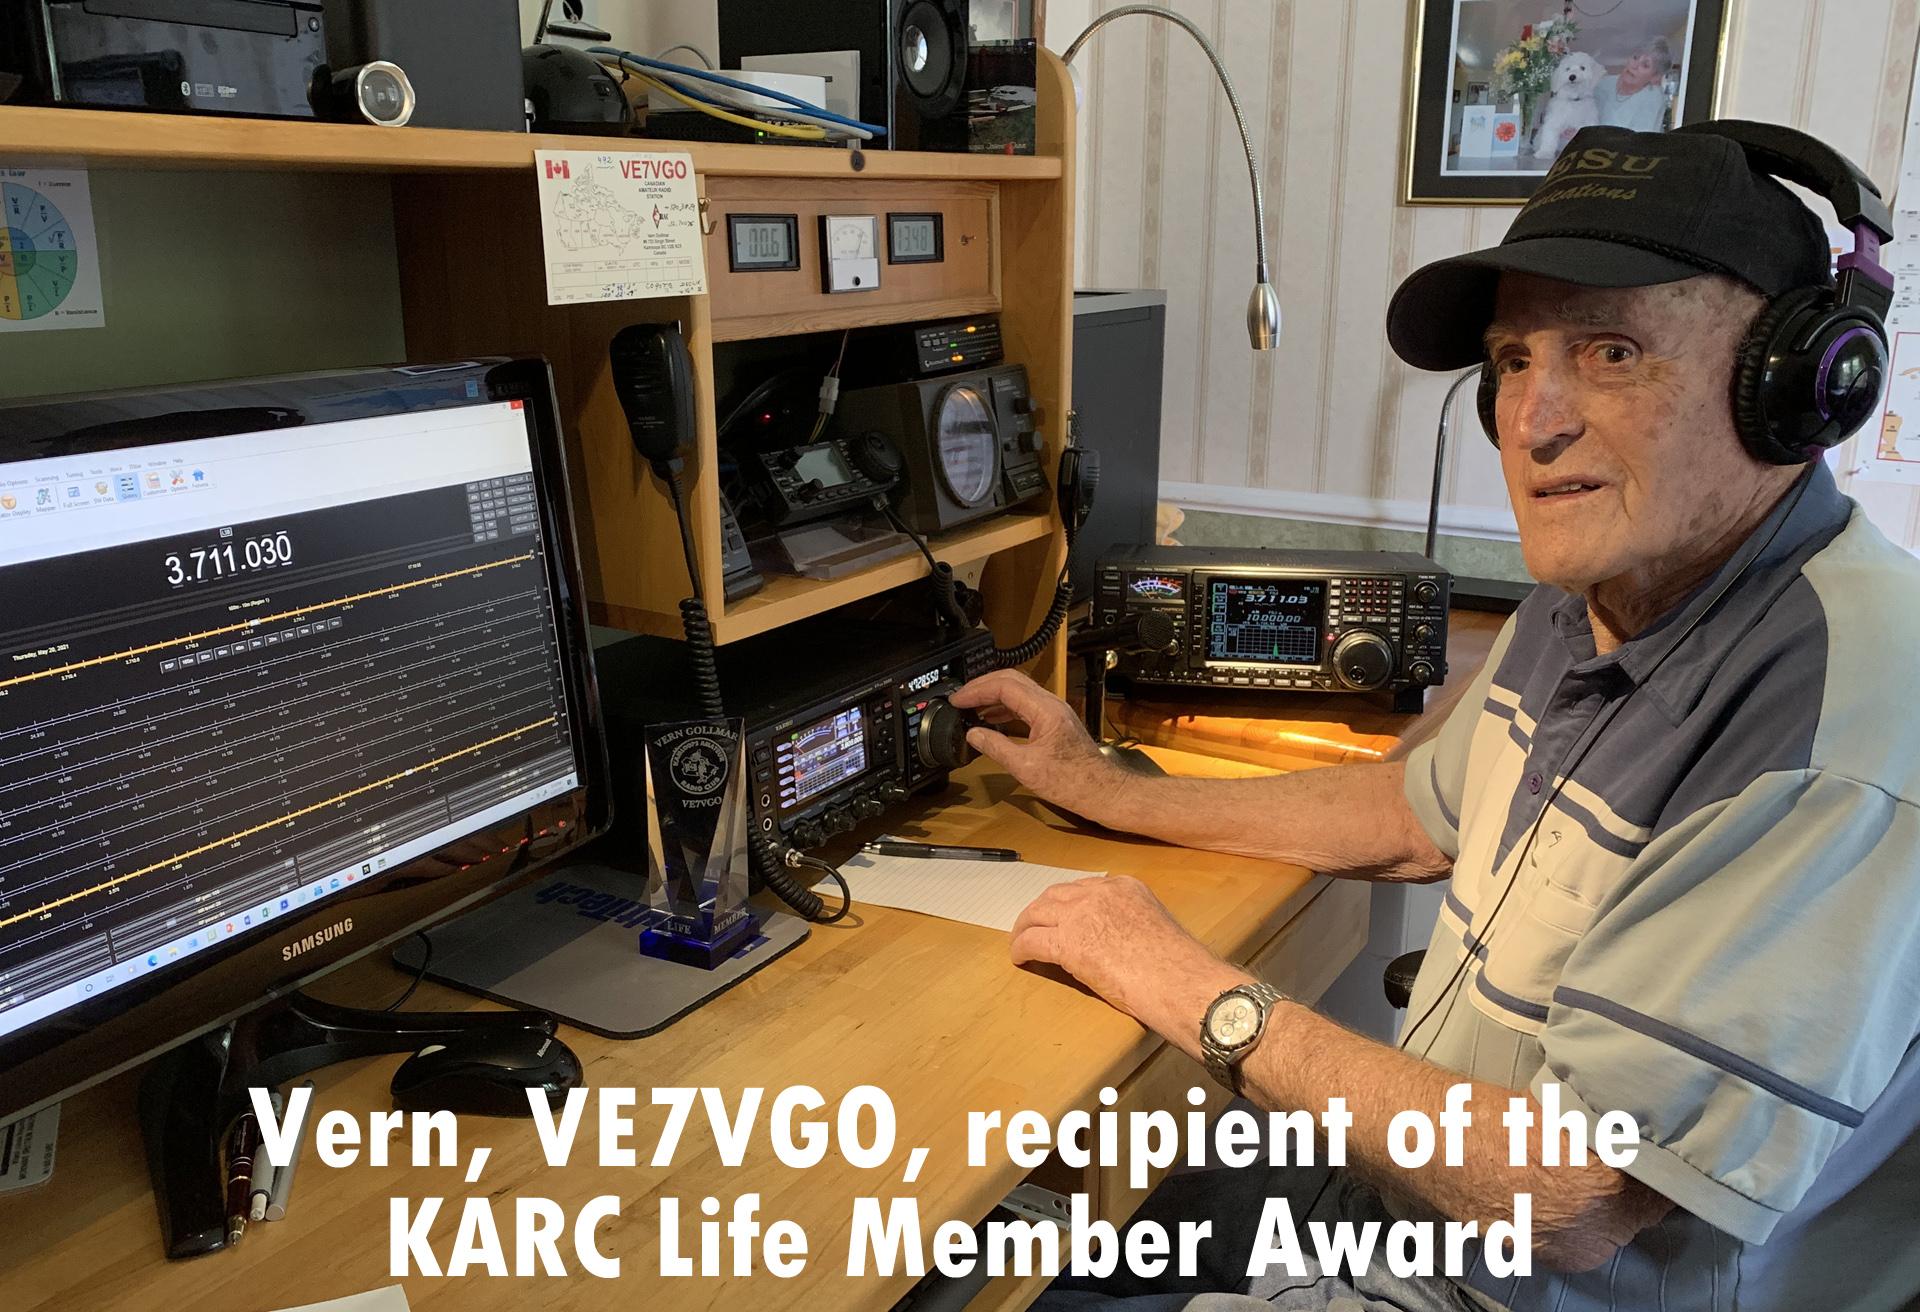 Vern, VE7VGO, recipient of the KARC Life Member Award